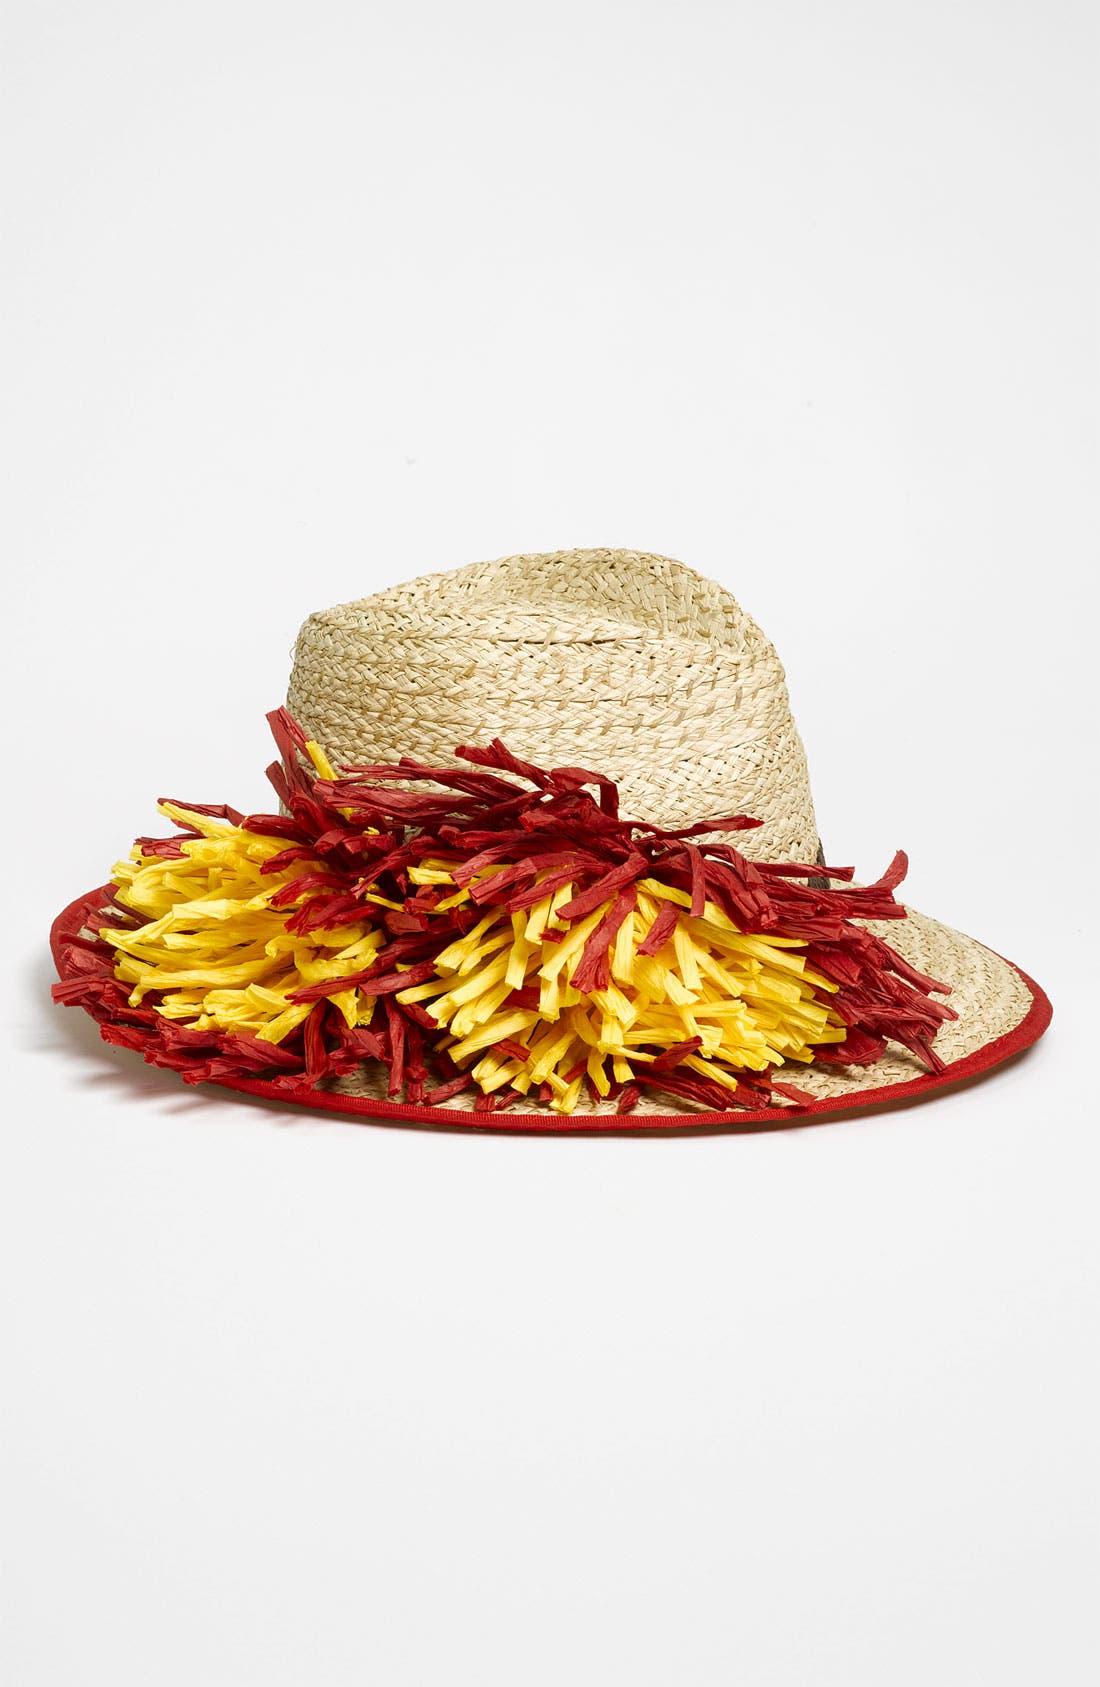 Alternate Image 1 Selected - Betsey Johnson 'Flower' Straw Fedora